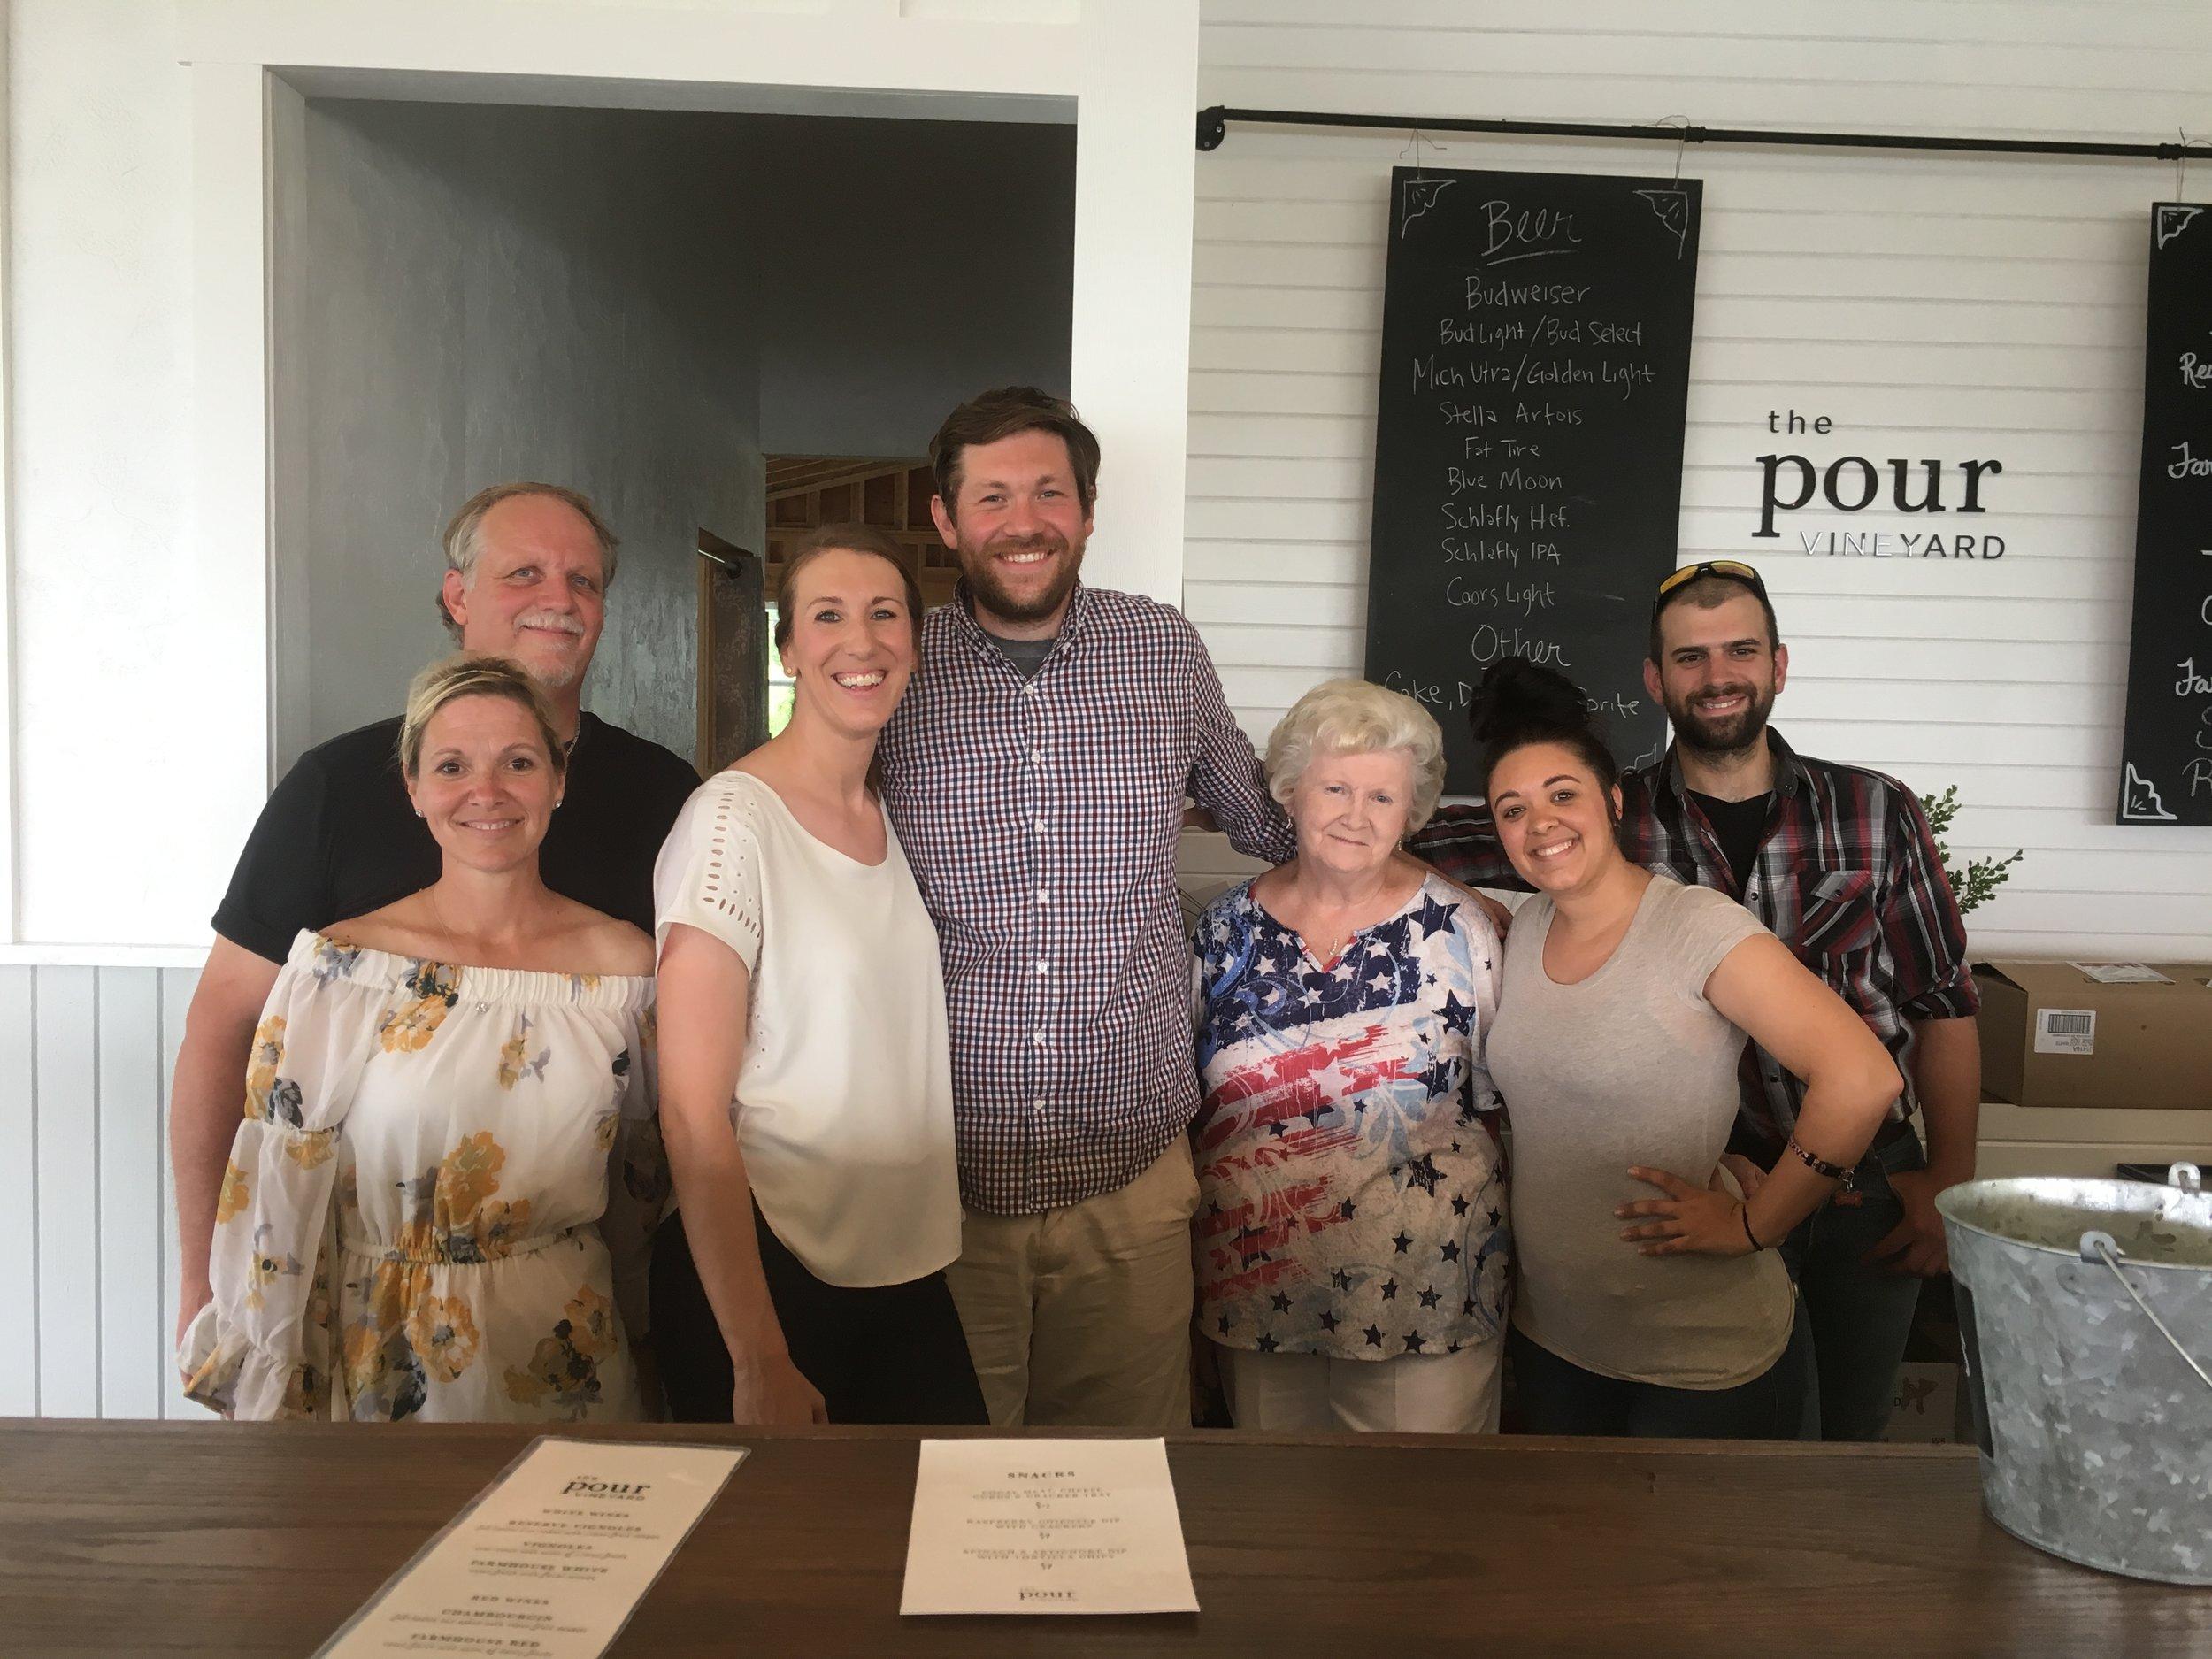 The-Pour-Vineyard